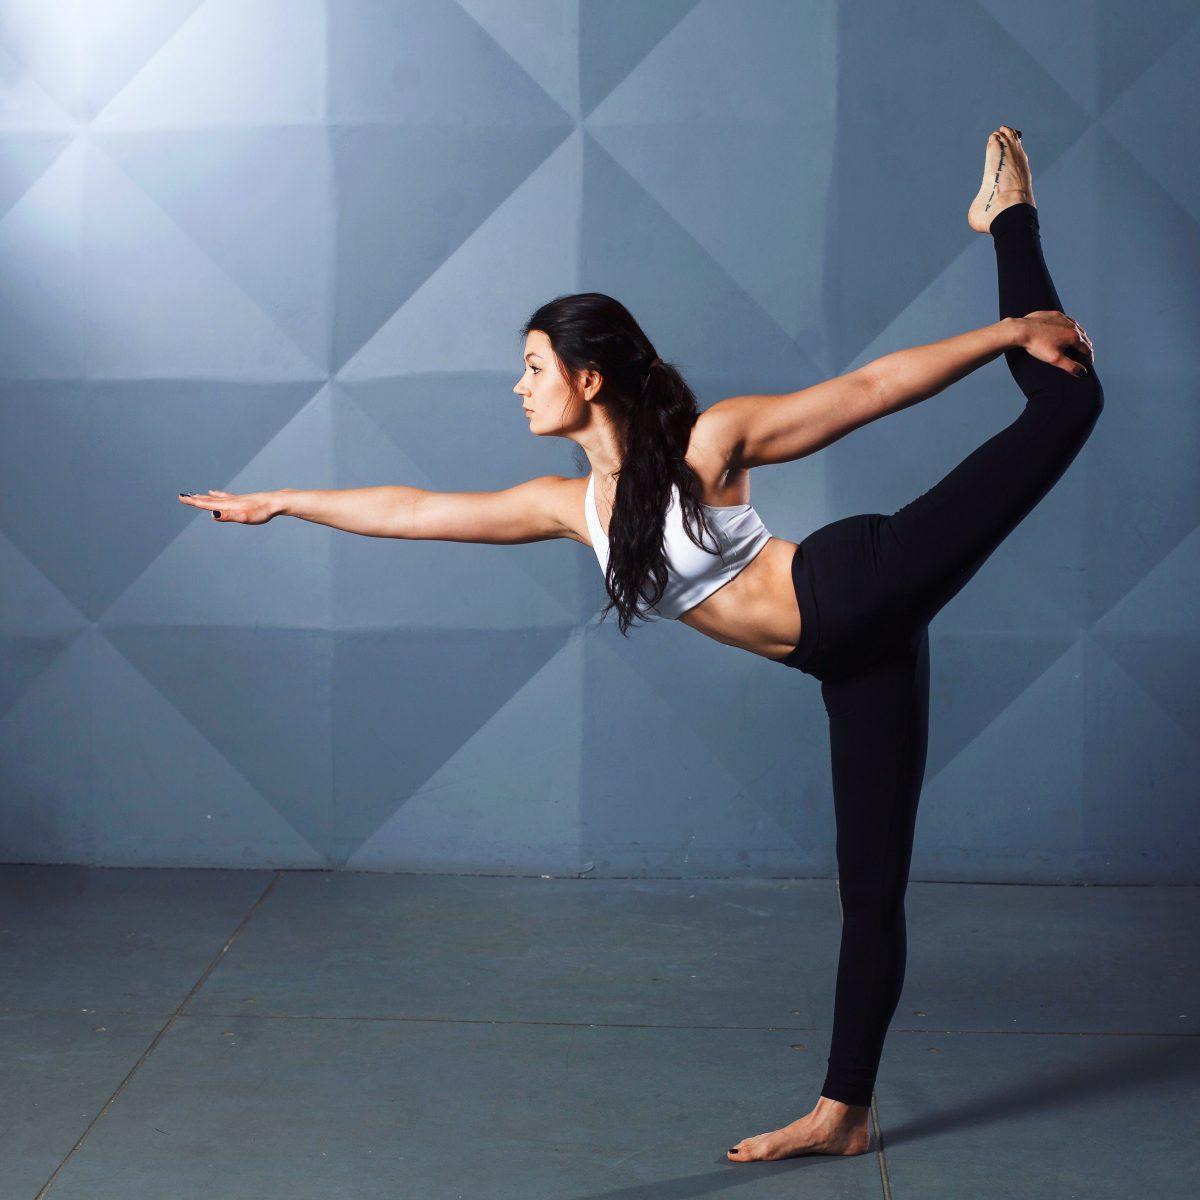 Les différentes disciplines en Gymnastique